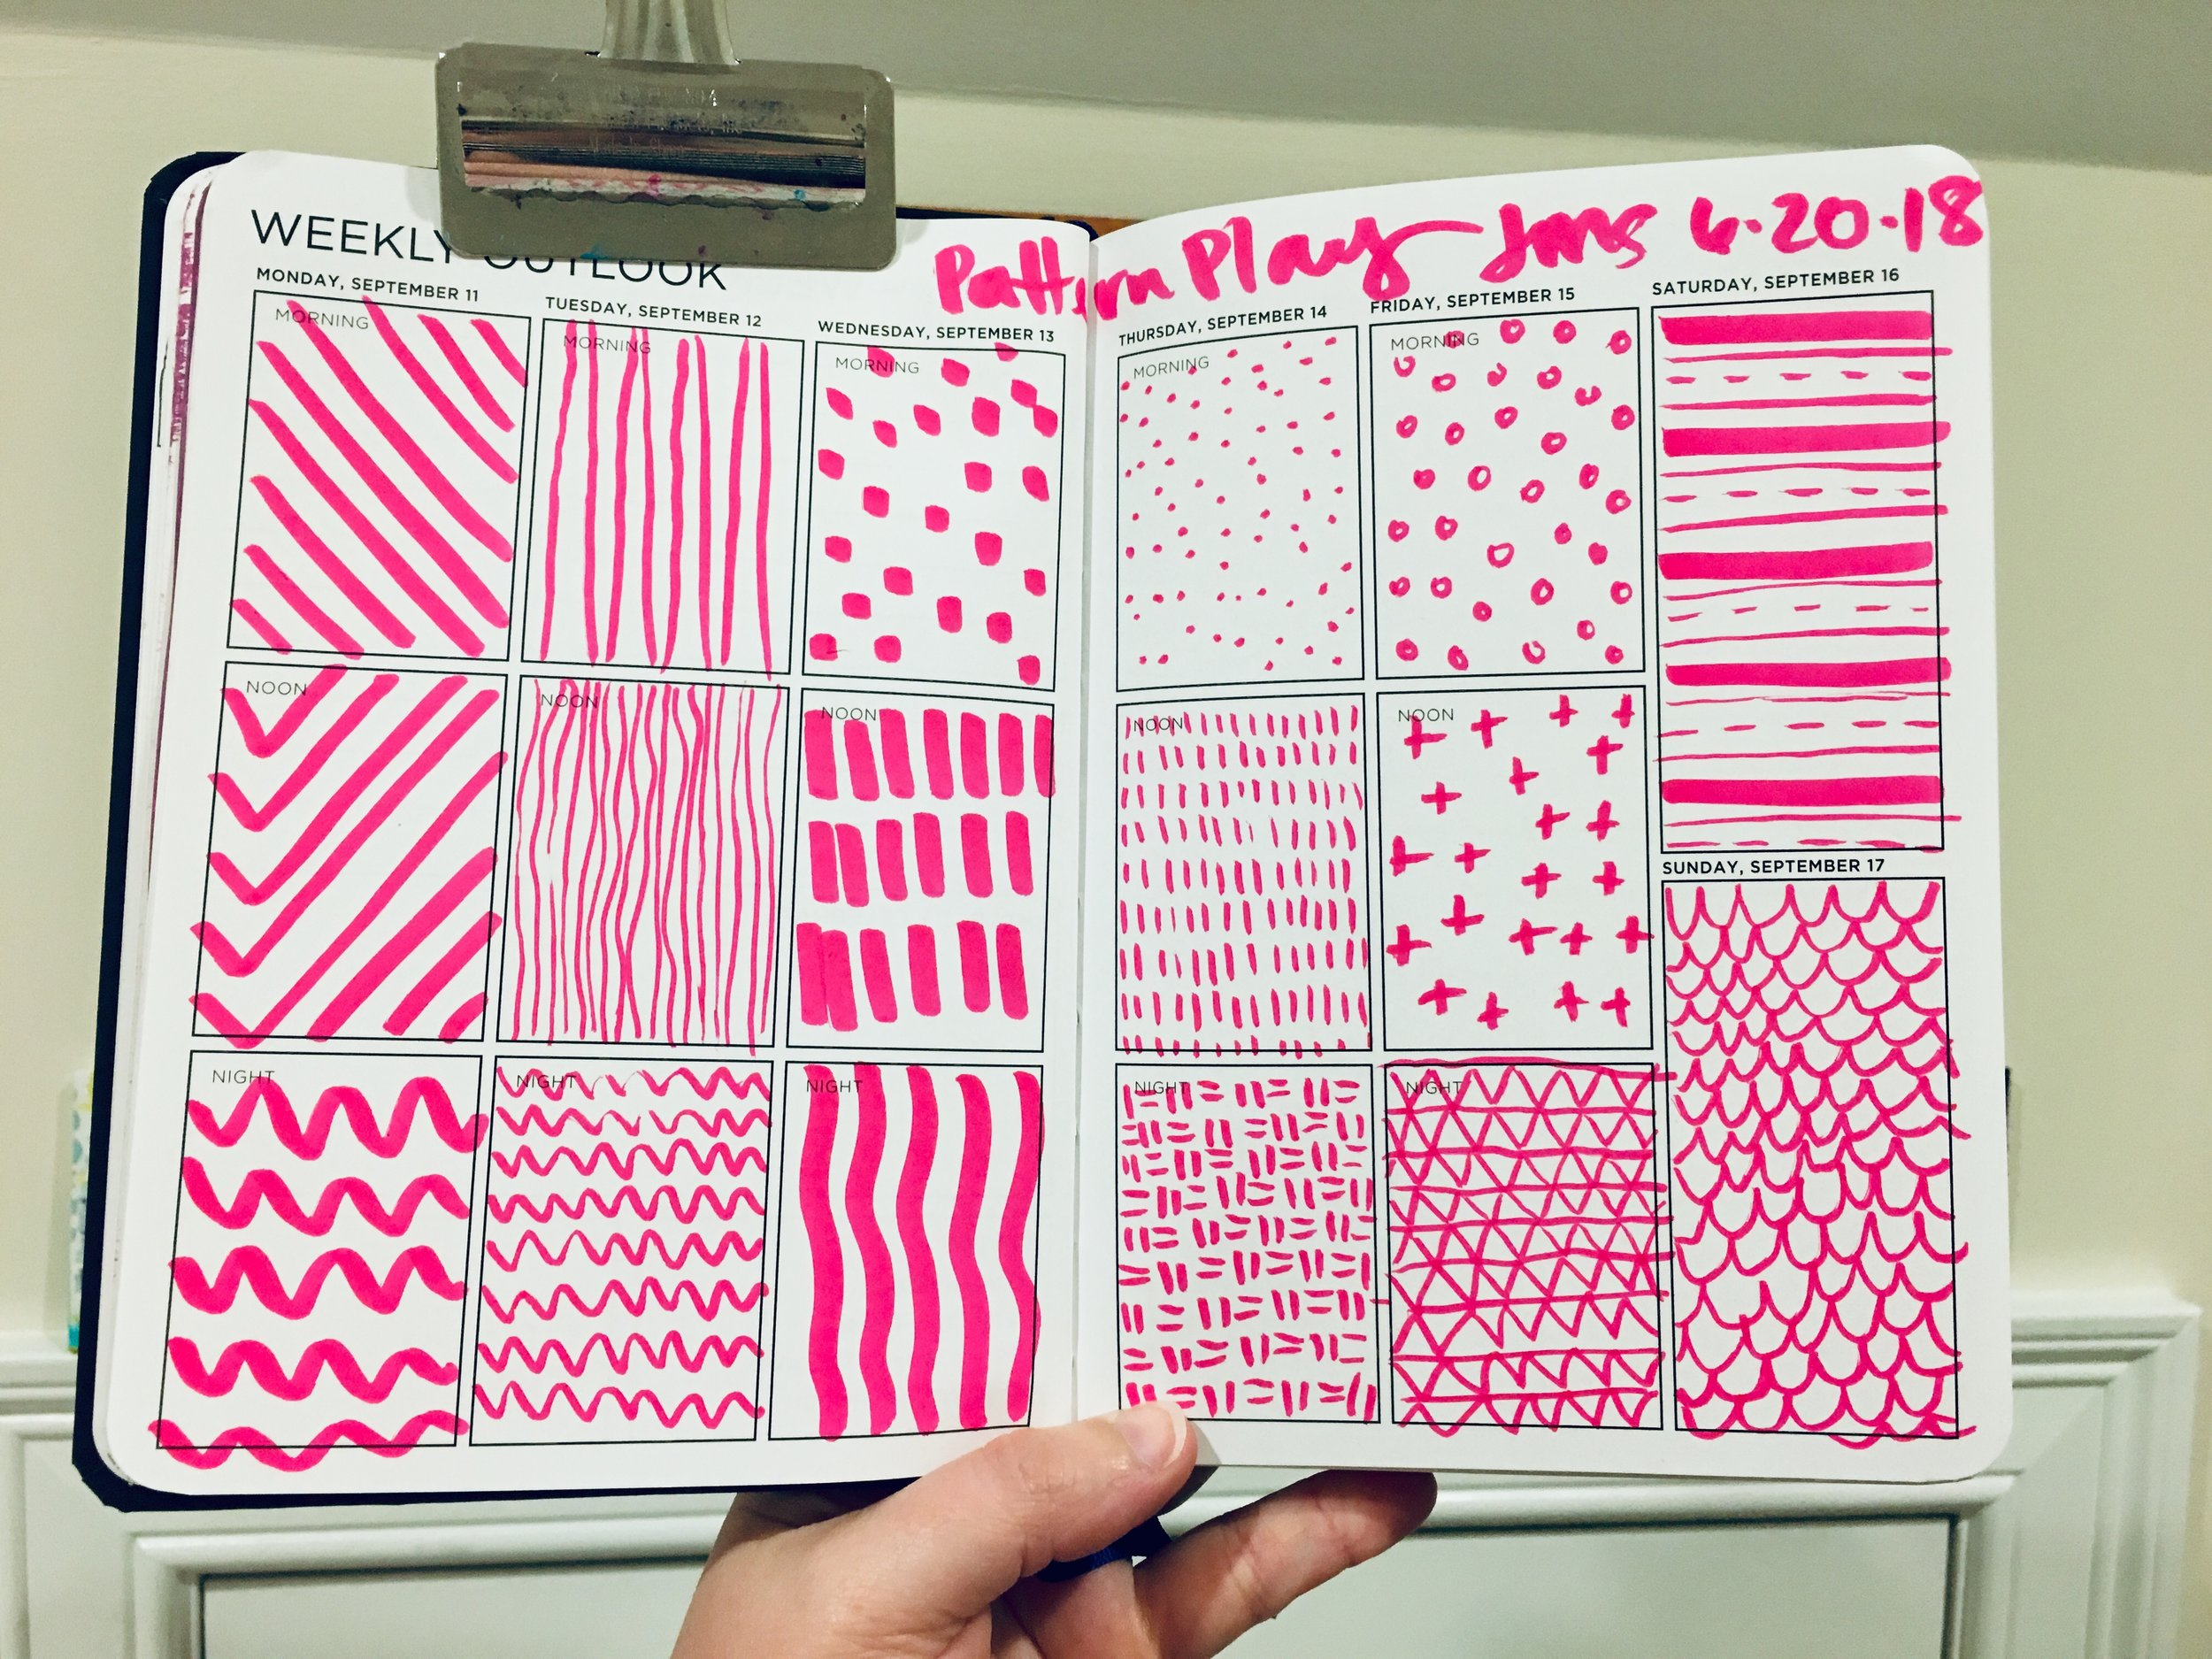 patternplay.jpg